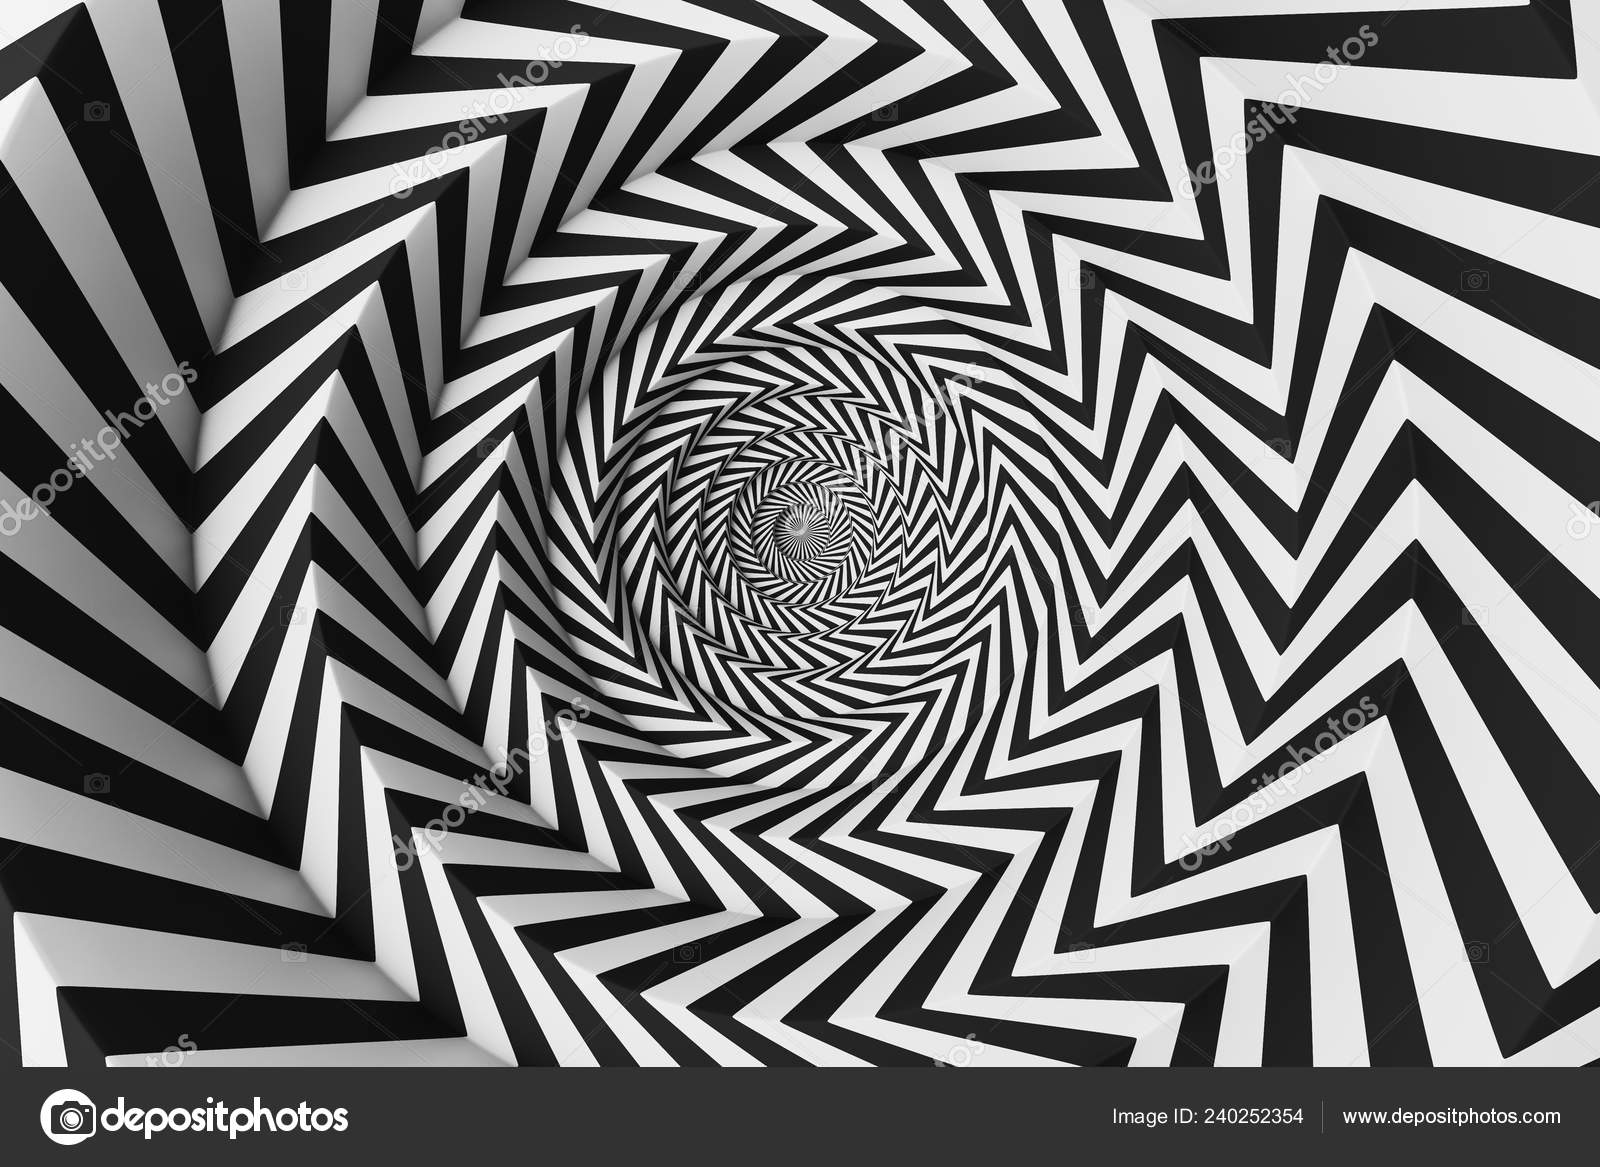 Abstract Art Concentric Circles